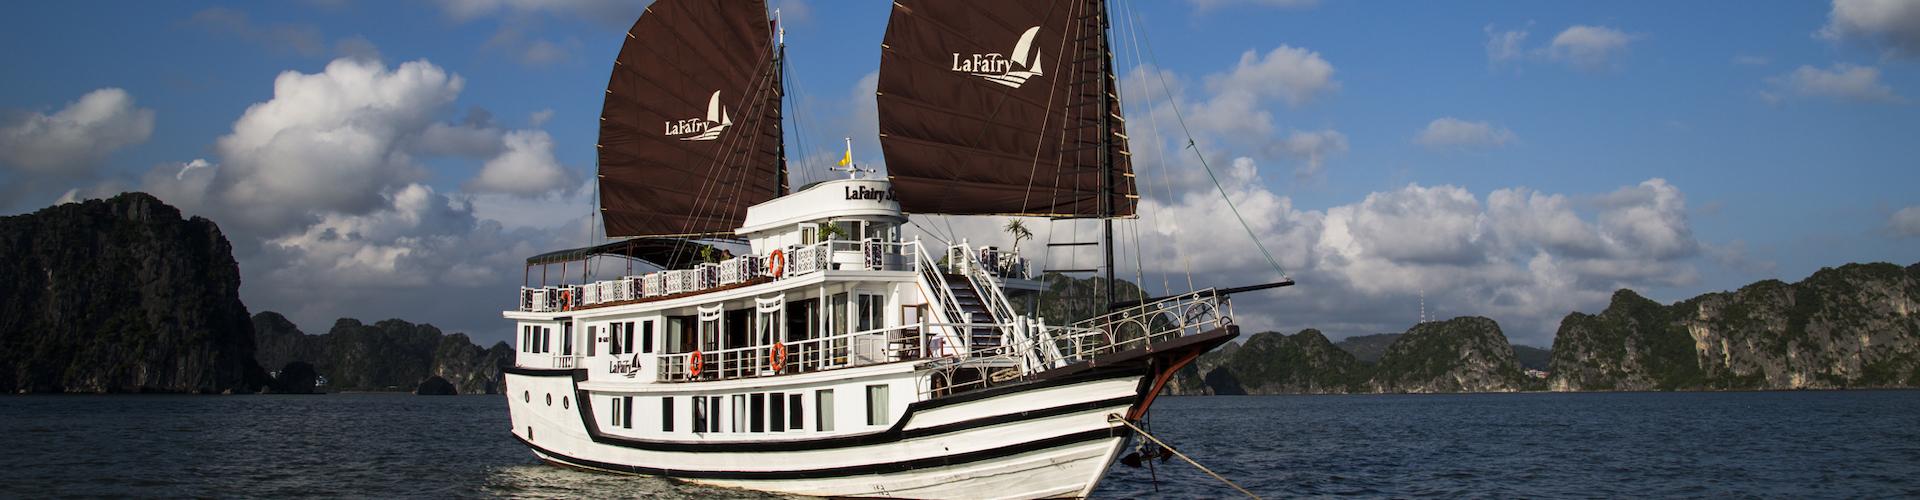 Du thuyền LaFairy Sails